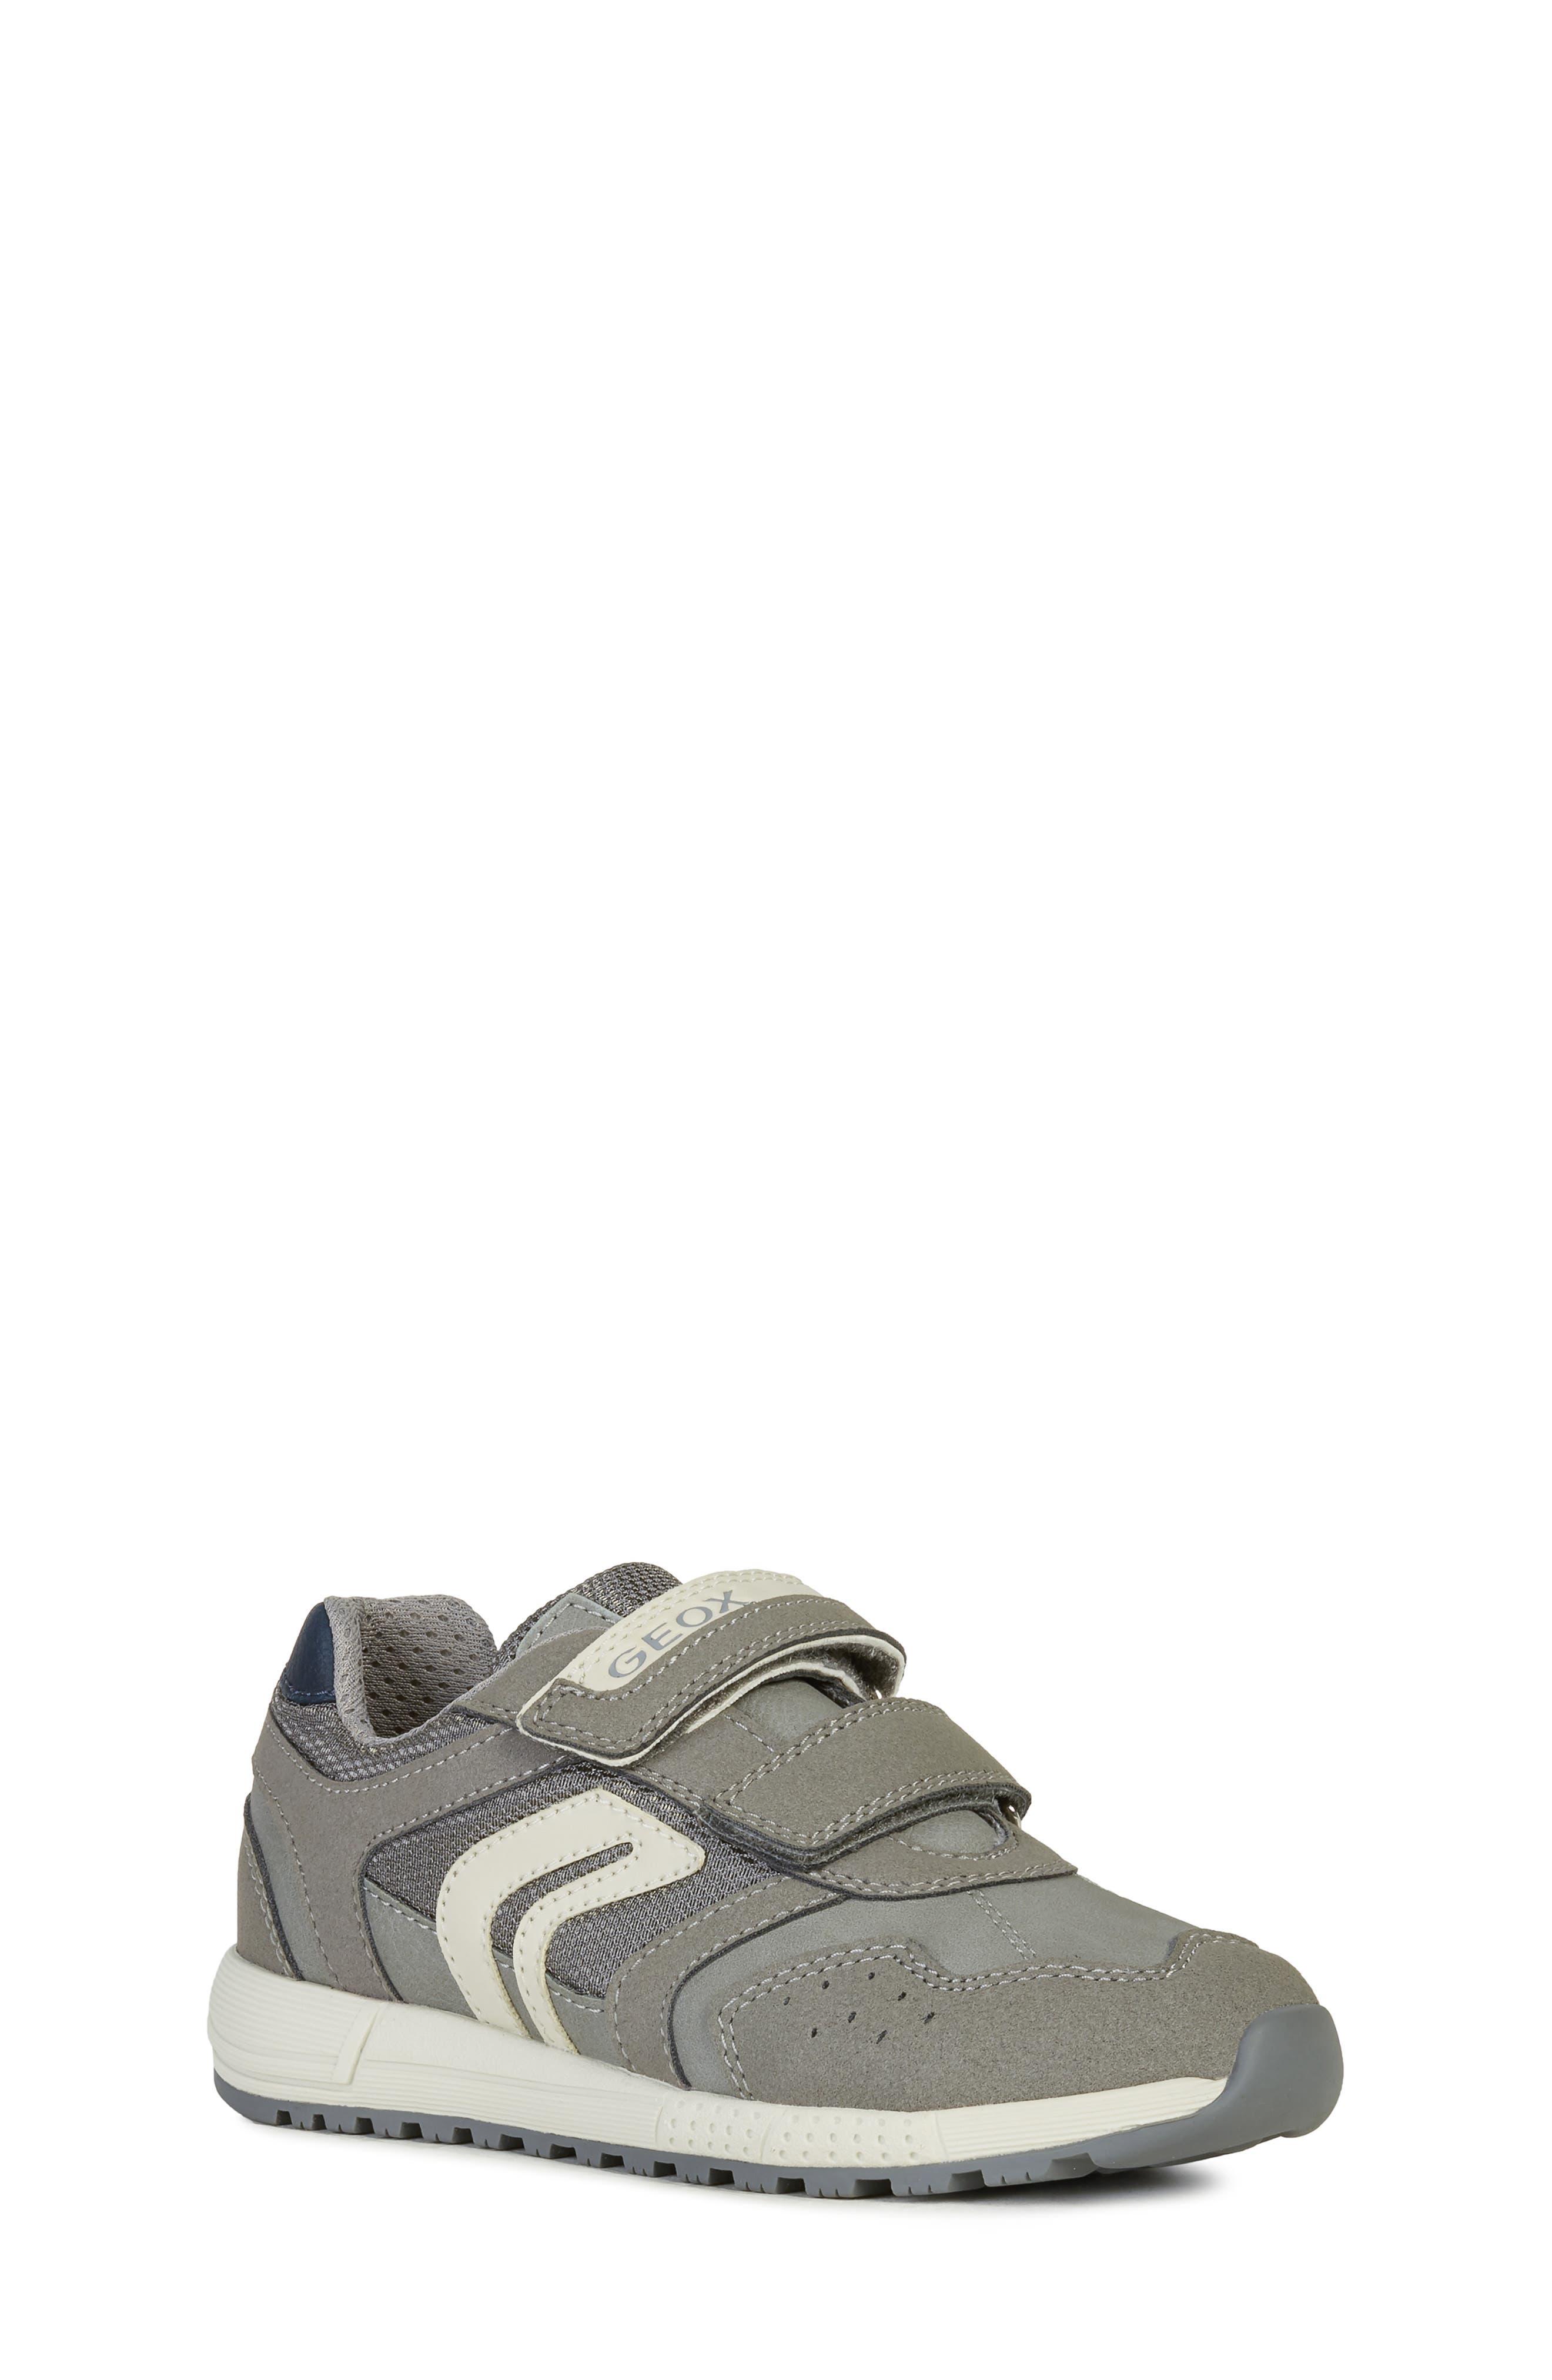 Toddler Geox Alben 7 Sneaker Size 12US  30EU  Grey